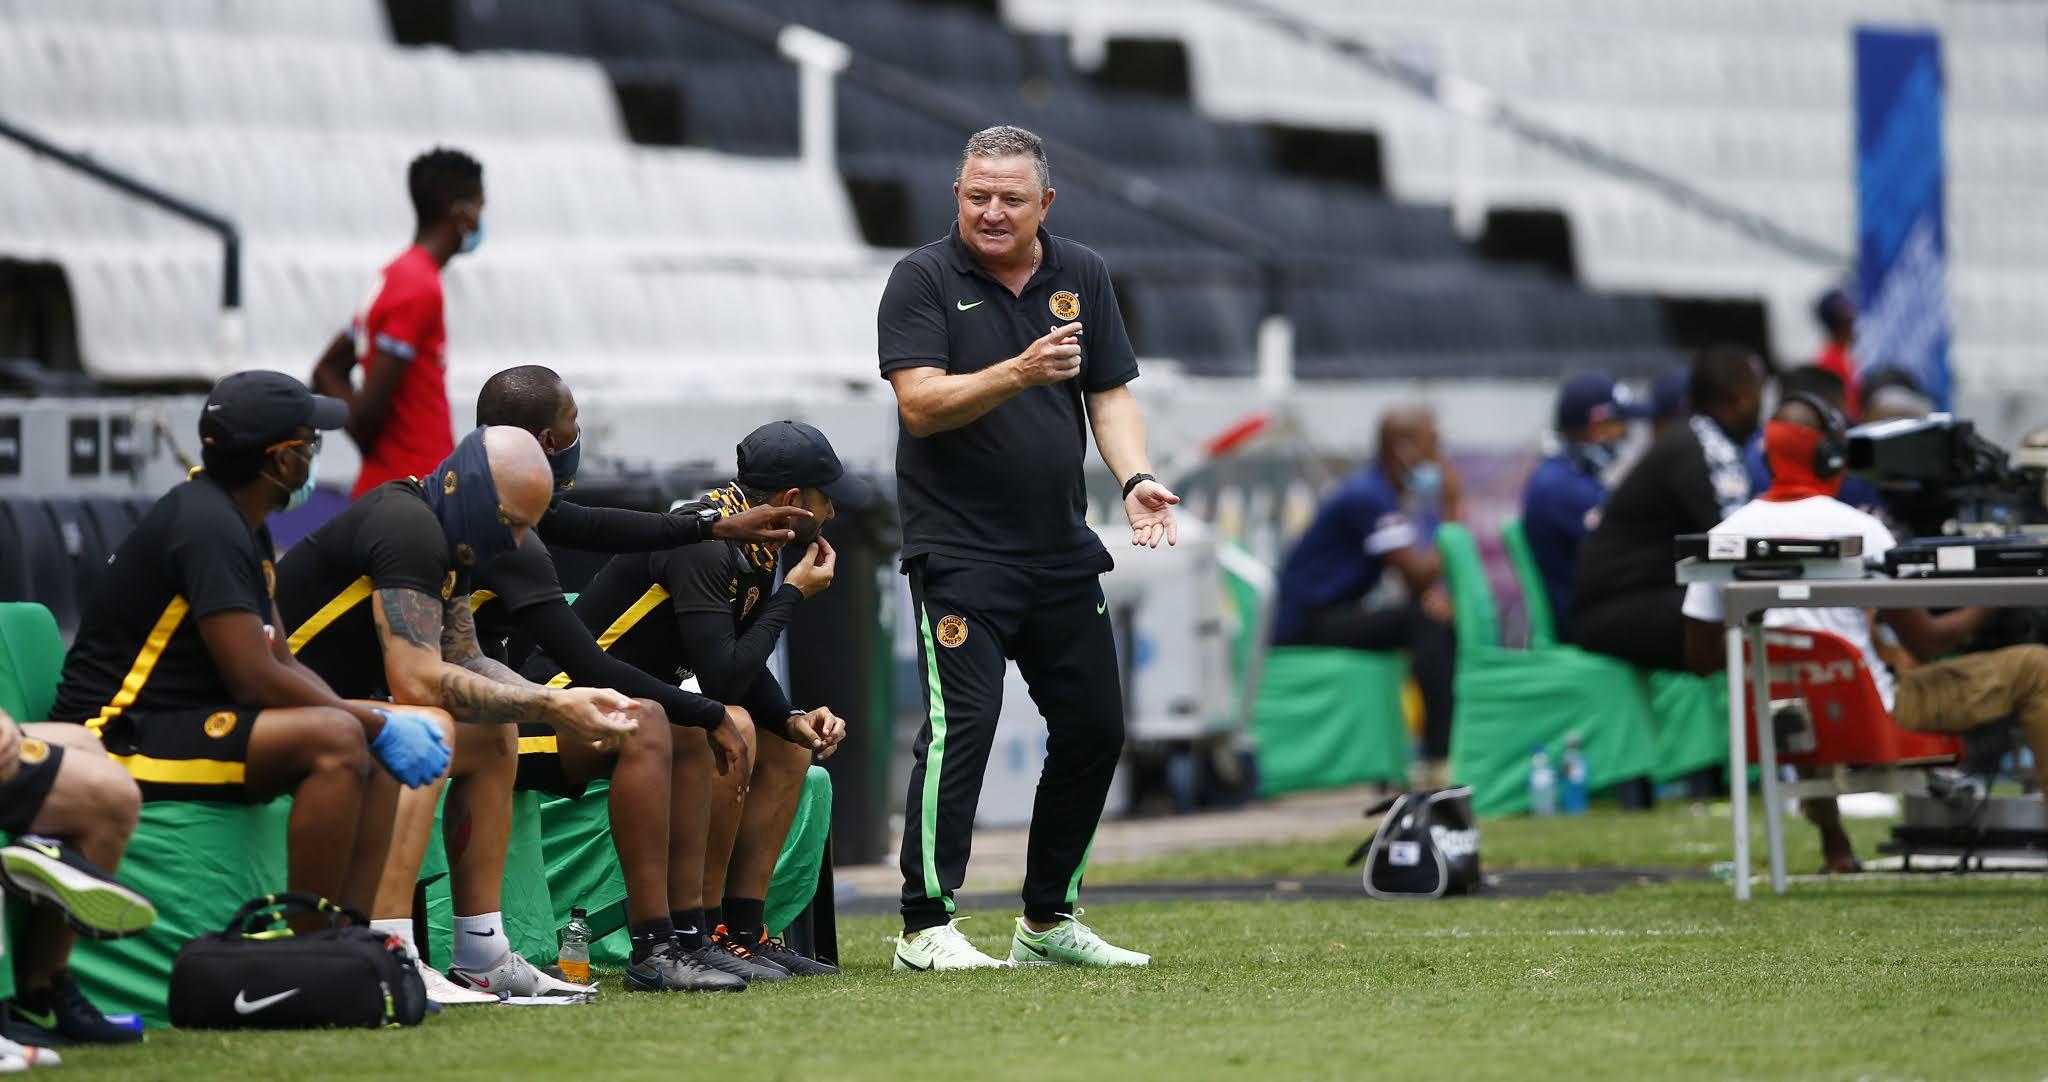 Gavin Hunt will seek to break Masandawana's unbeaten run in the DStv Premiership